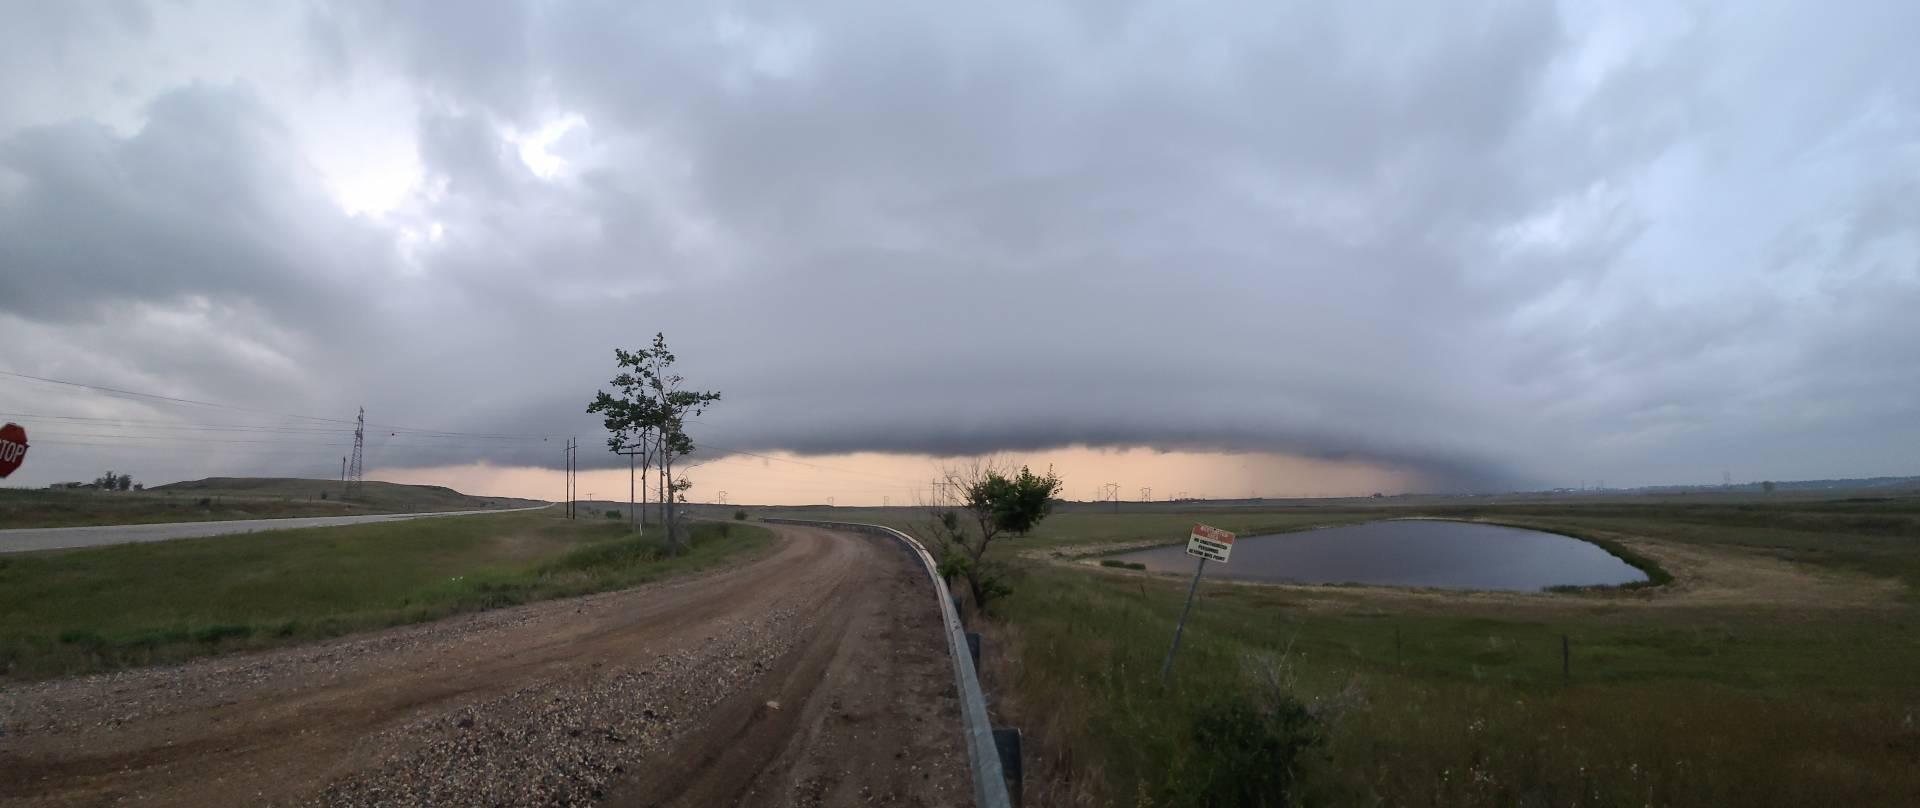 Eerie Shelf cloud now moving into Estevan, SK 7:17pm #skstorm